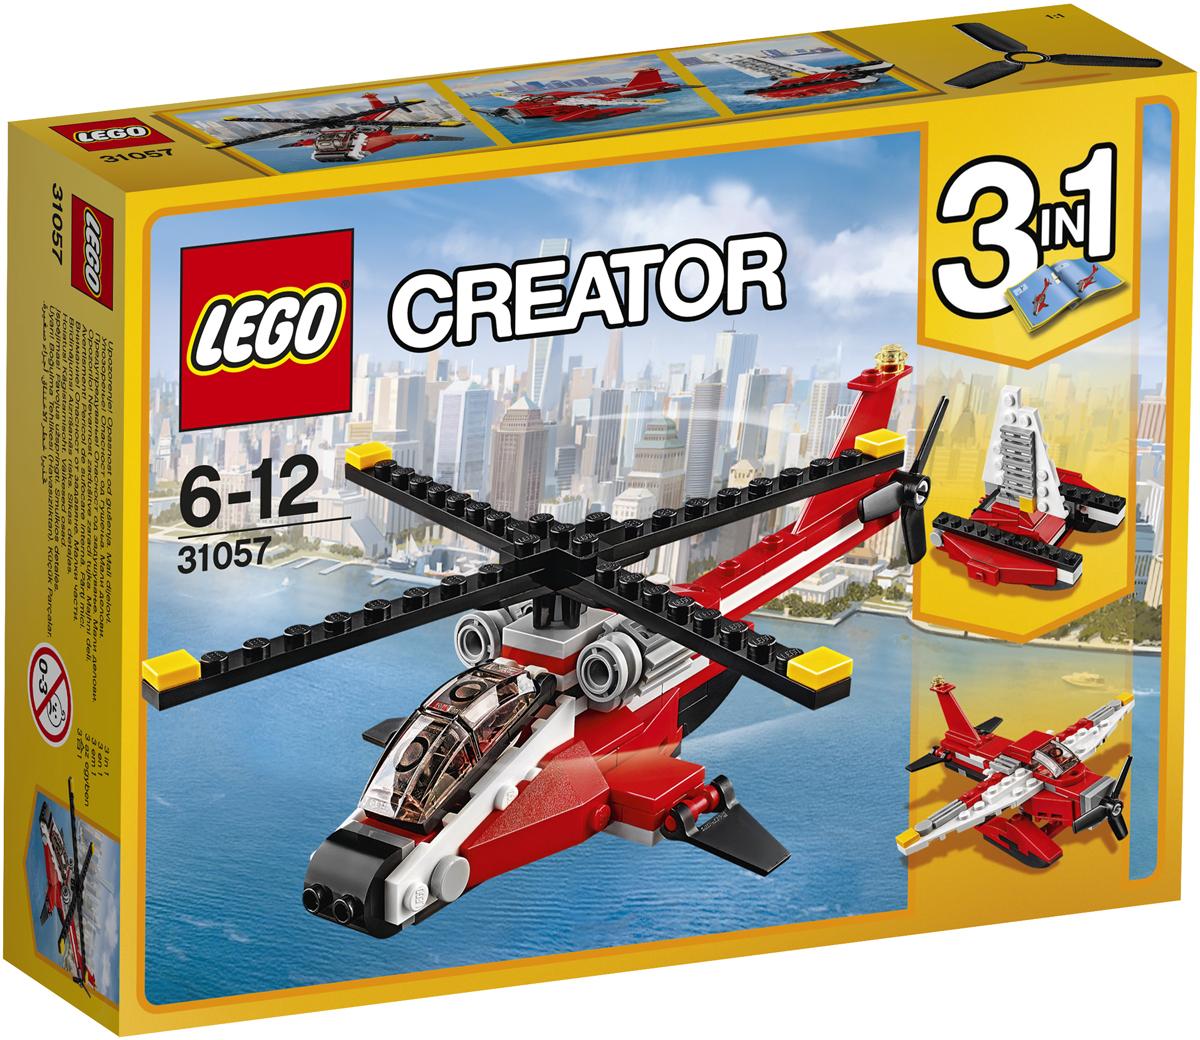 LEGO Creator Конструктор Красный вертолет 31057 конструктор lego creator мотоцикл оранжевый 31059